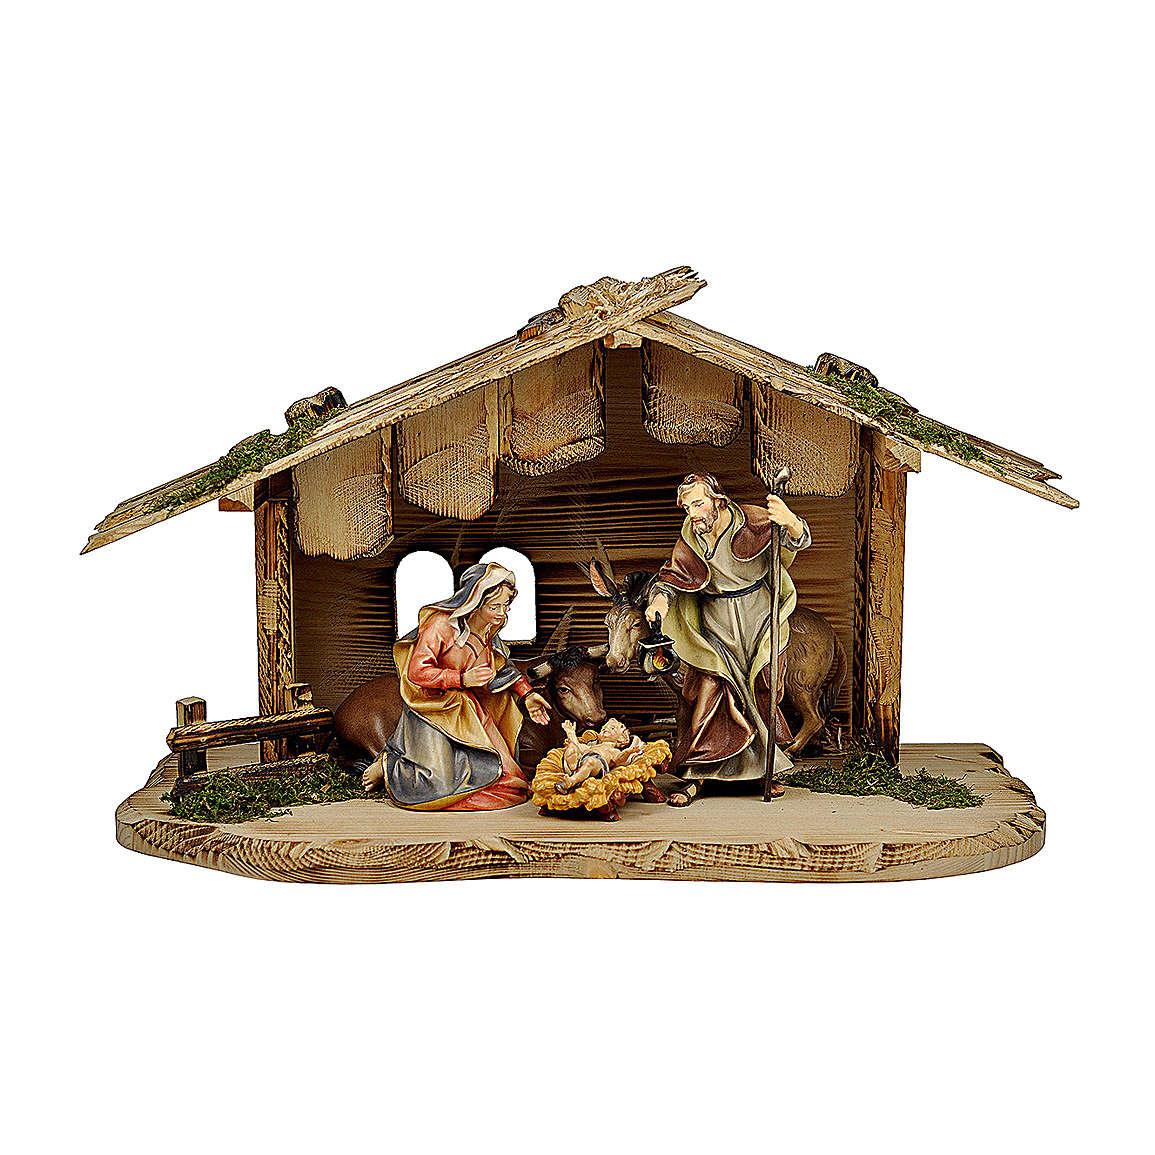 Sacra famiglia con bue e asino presepe Original legno dipinto in Val Gardena 12 cm 5 pz 4